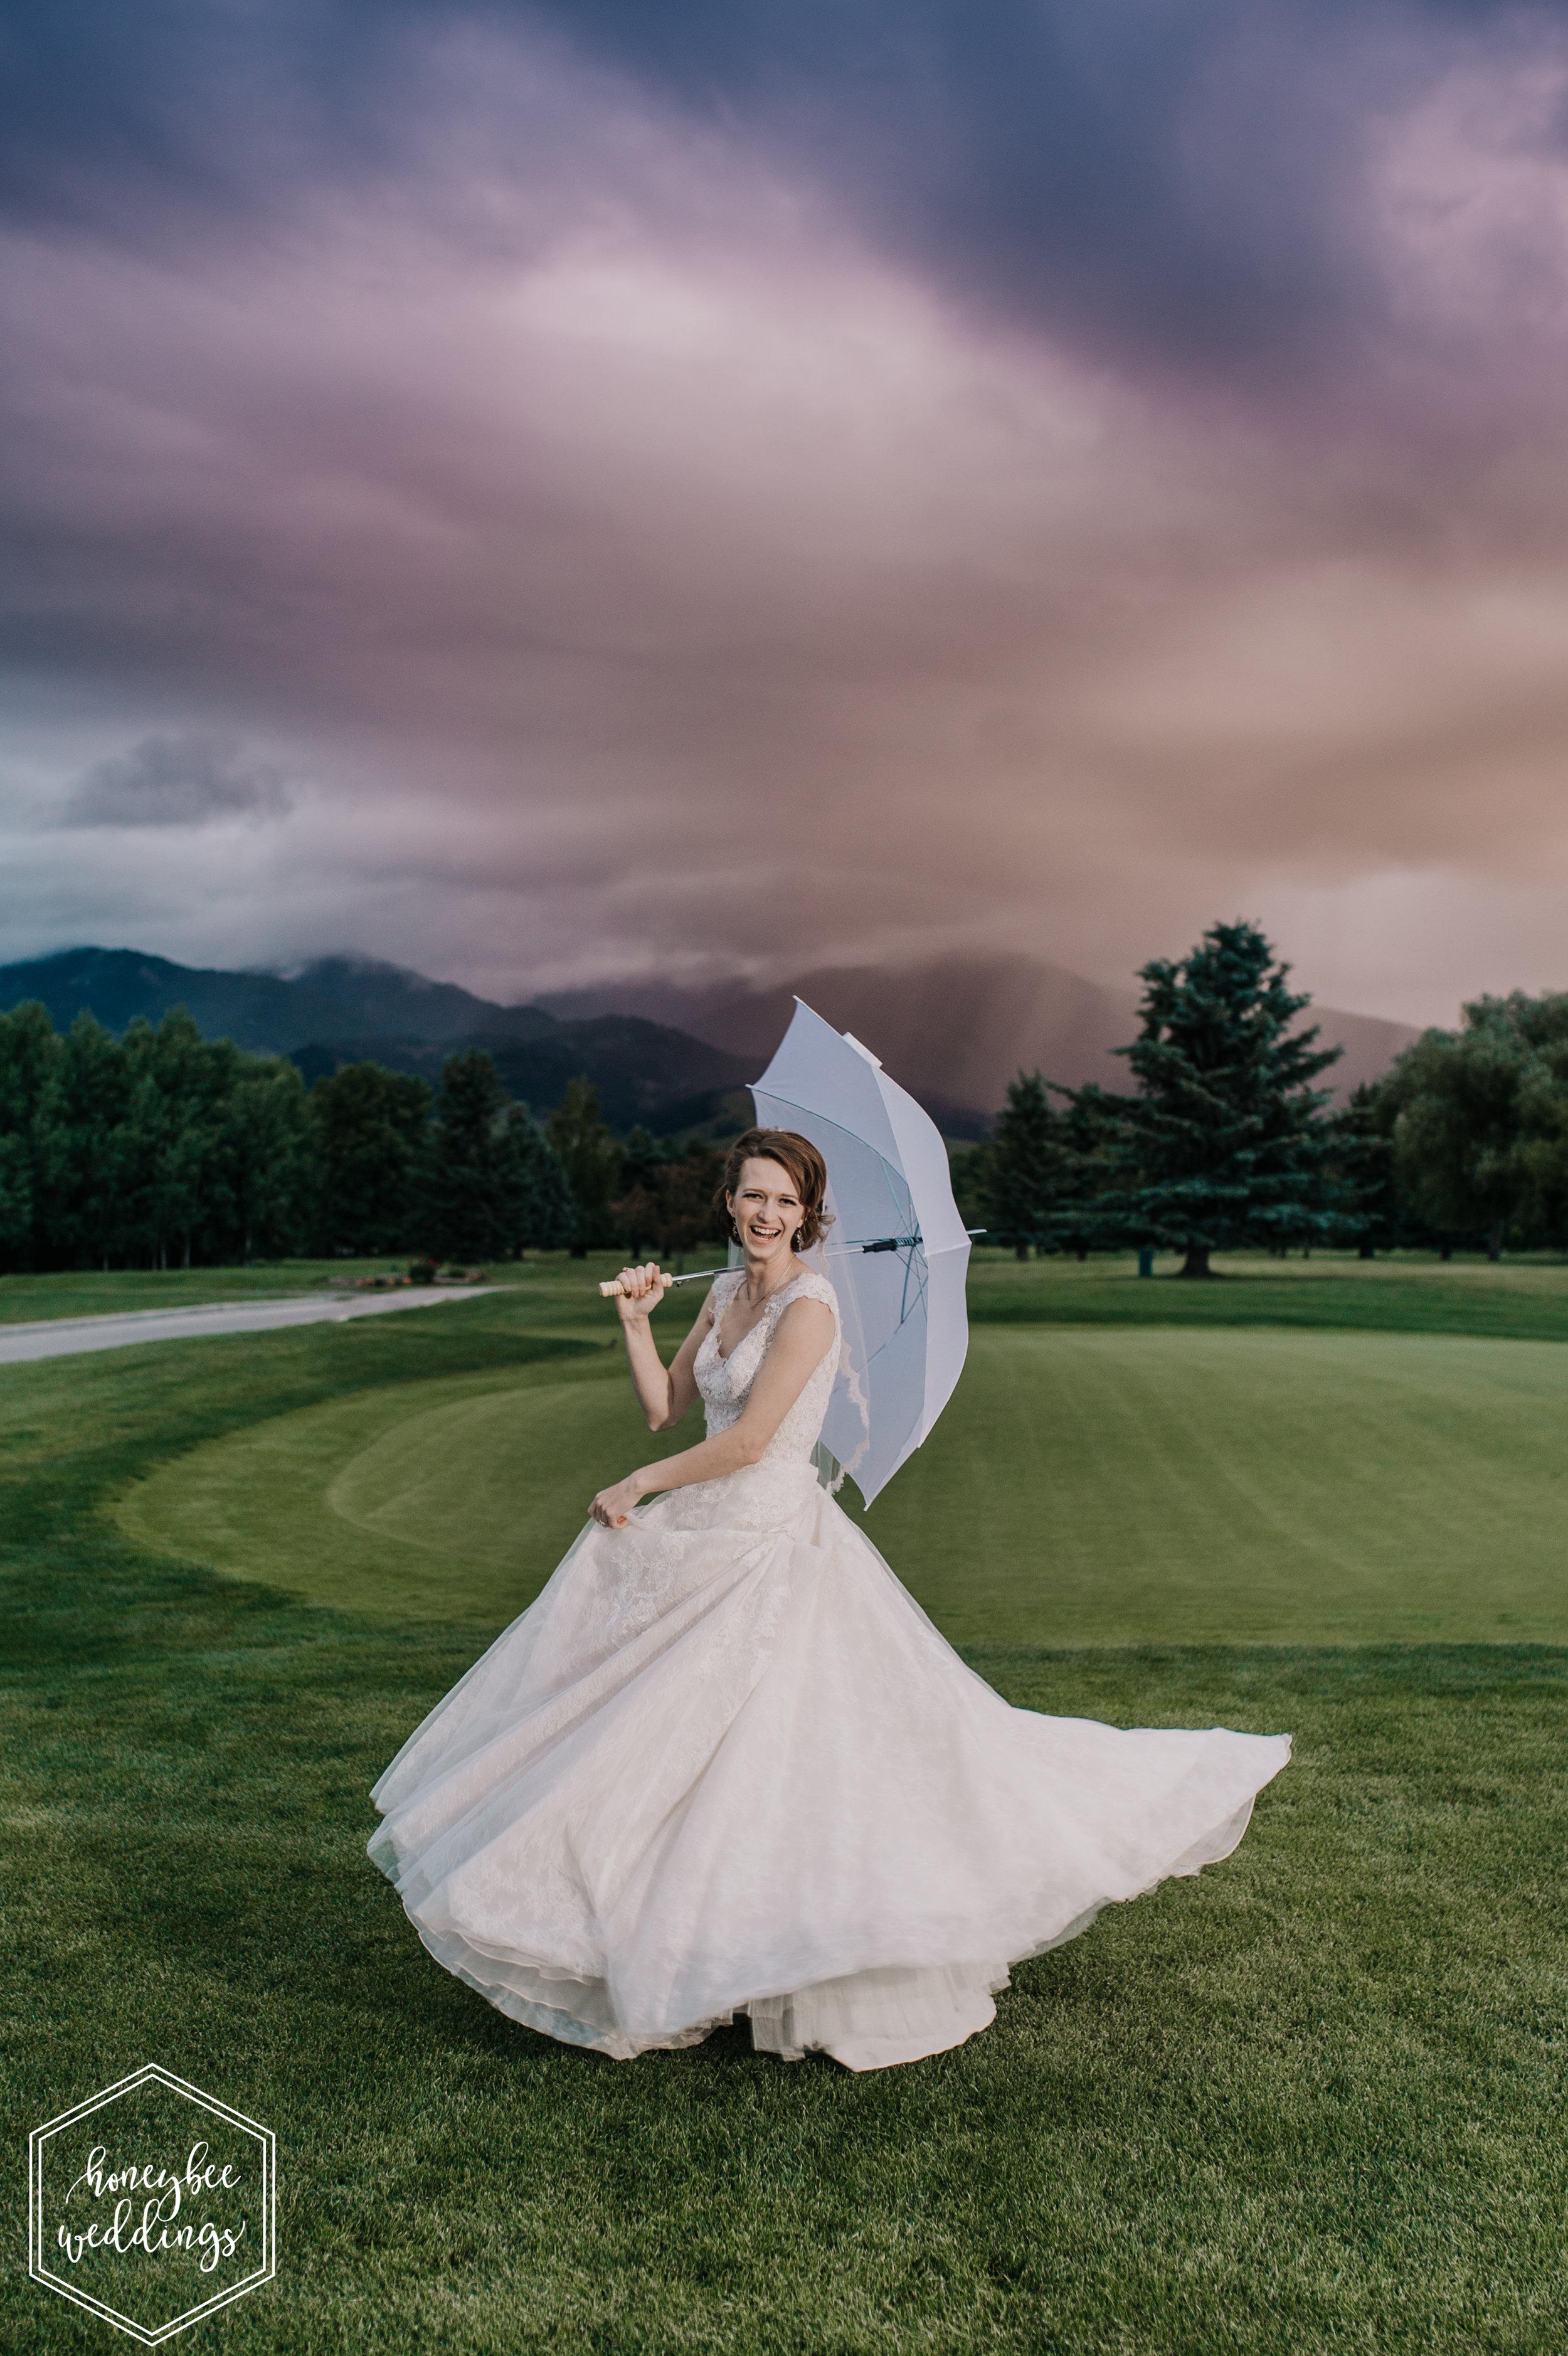 920 Riverside Country Club Wedding_Montana Wedding Photographer_Lauren Jackson + Evan Ivaldi 2018-8412.jpg